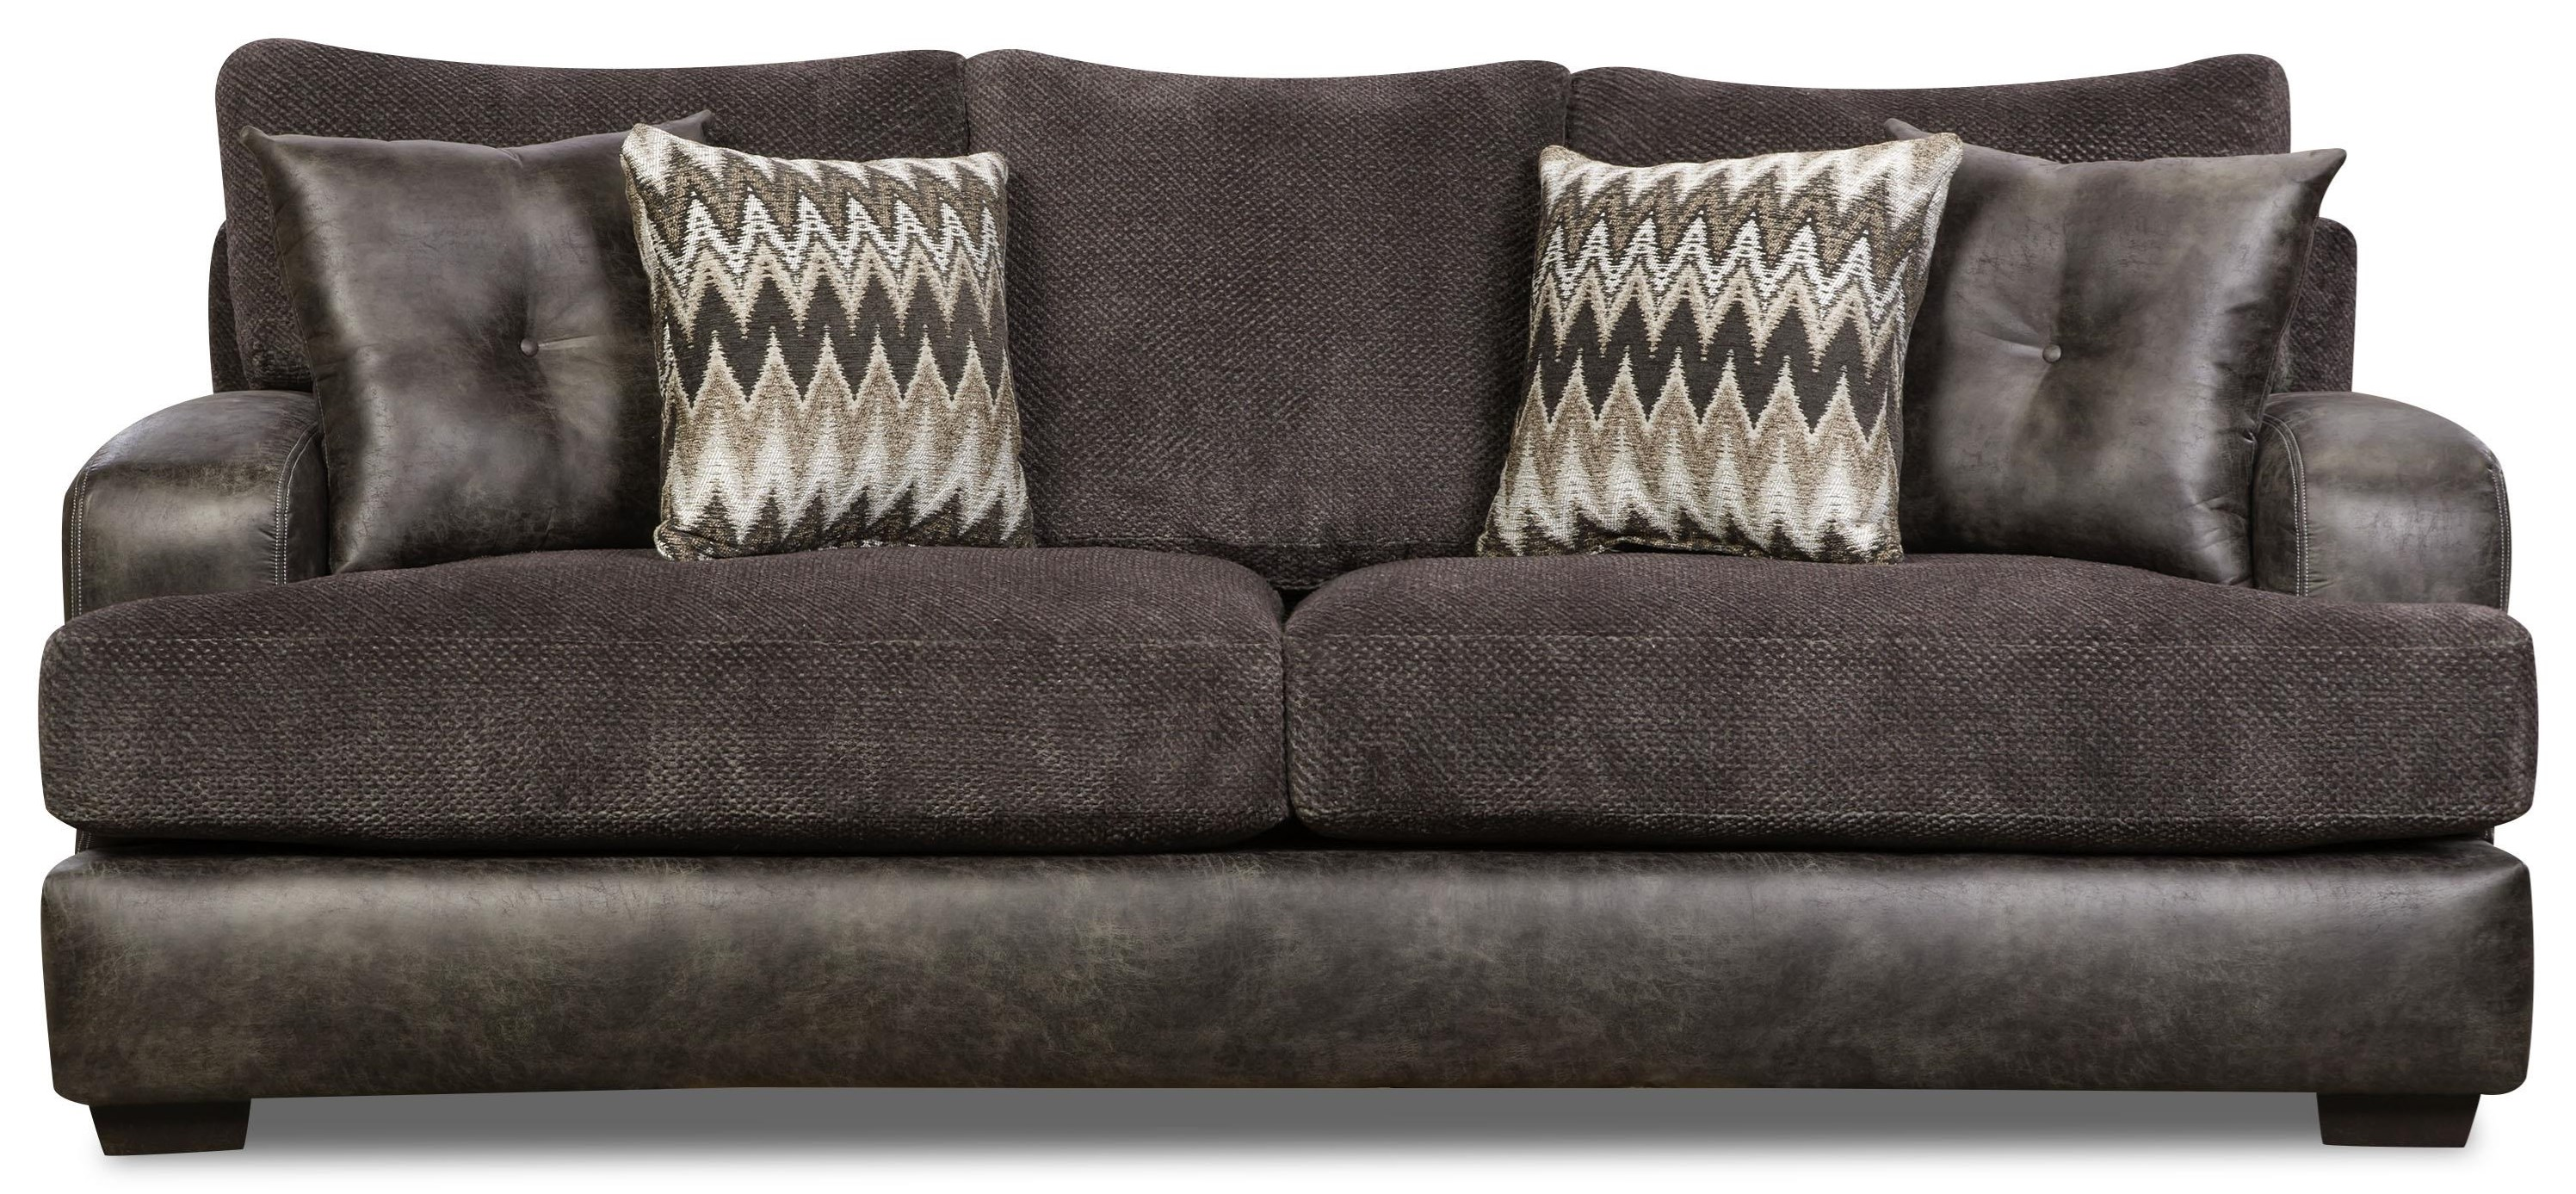 Corinthian Monroe Smoke Sofa - Item Number: 5203-MONROE-SMOKE